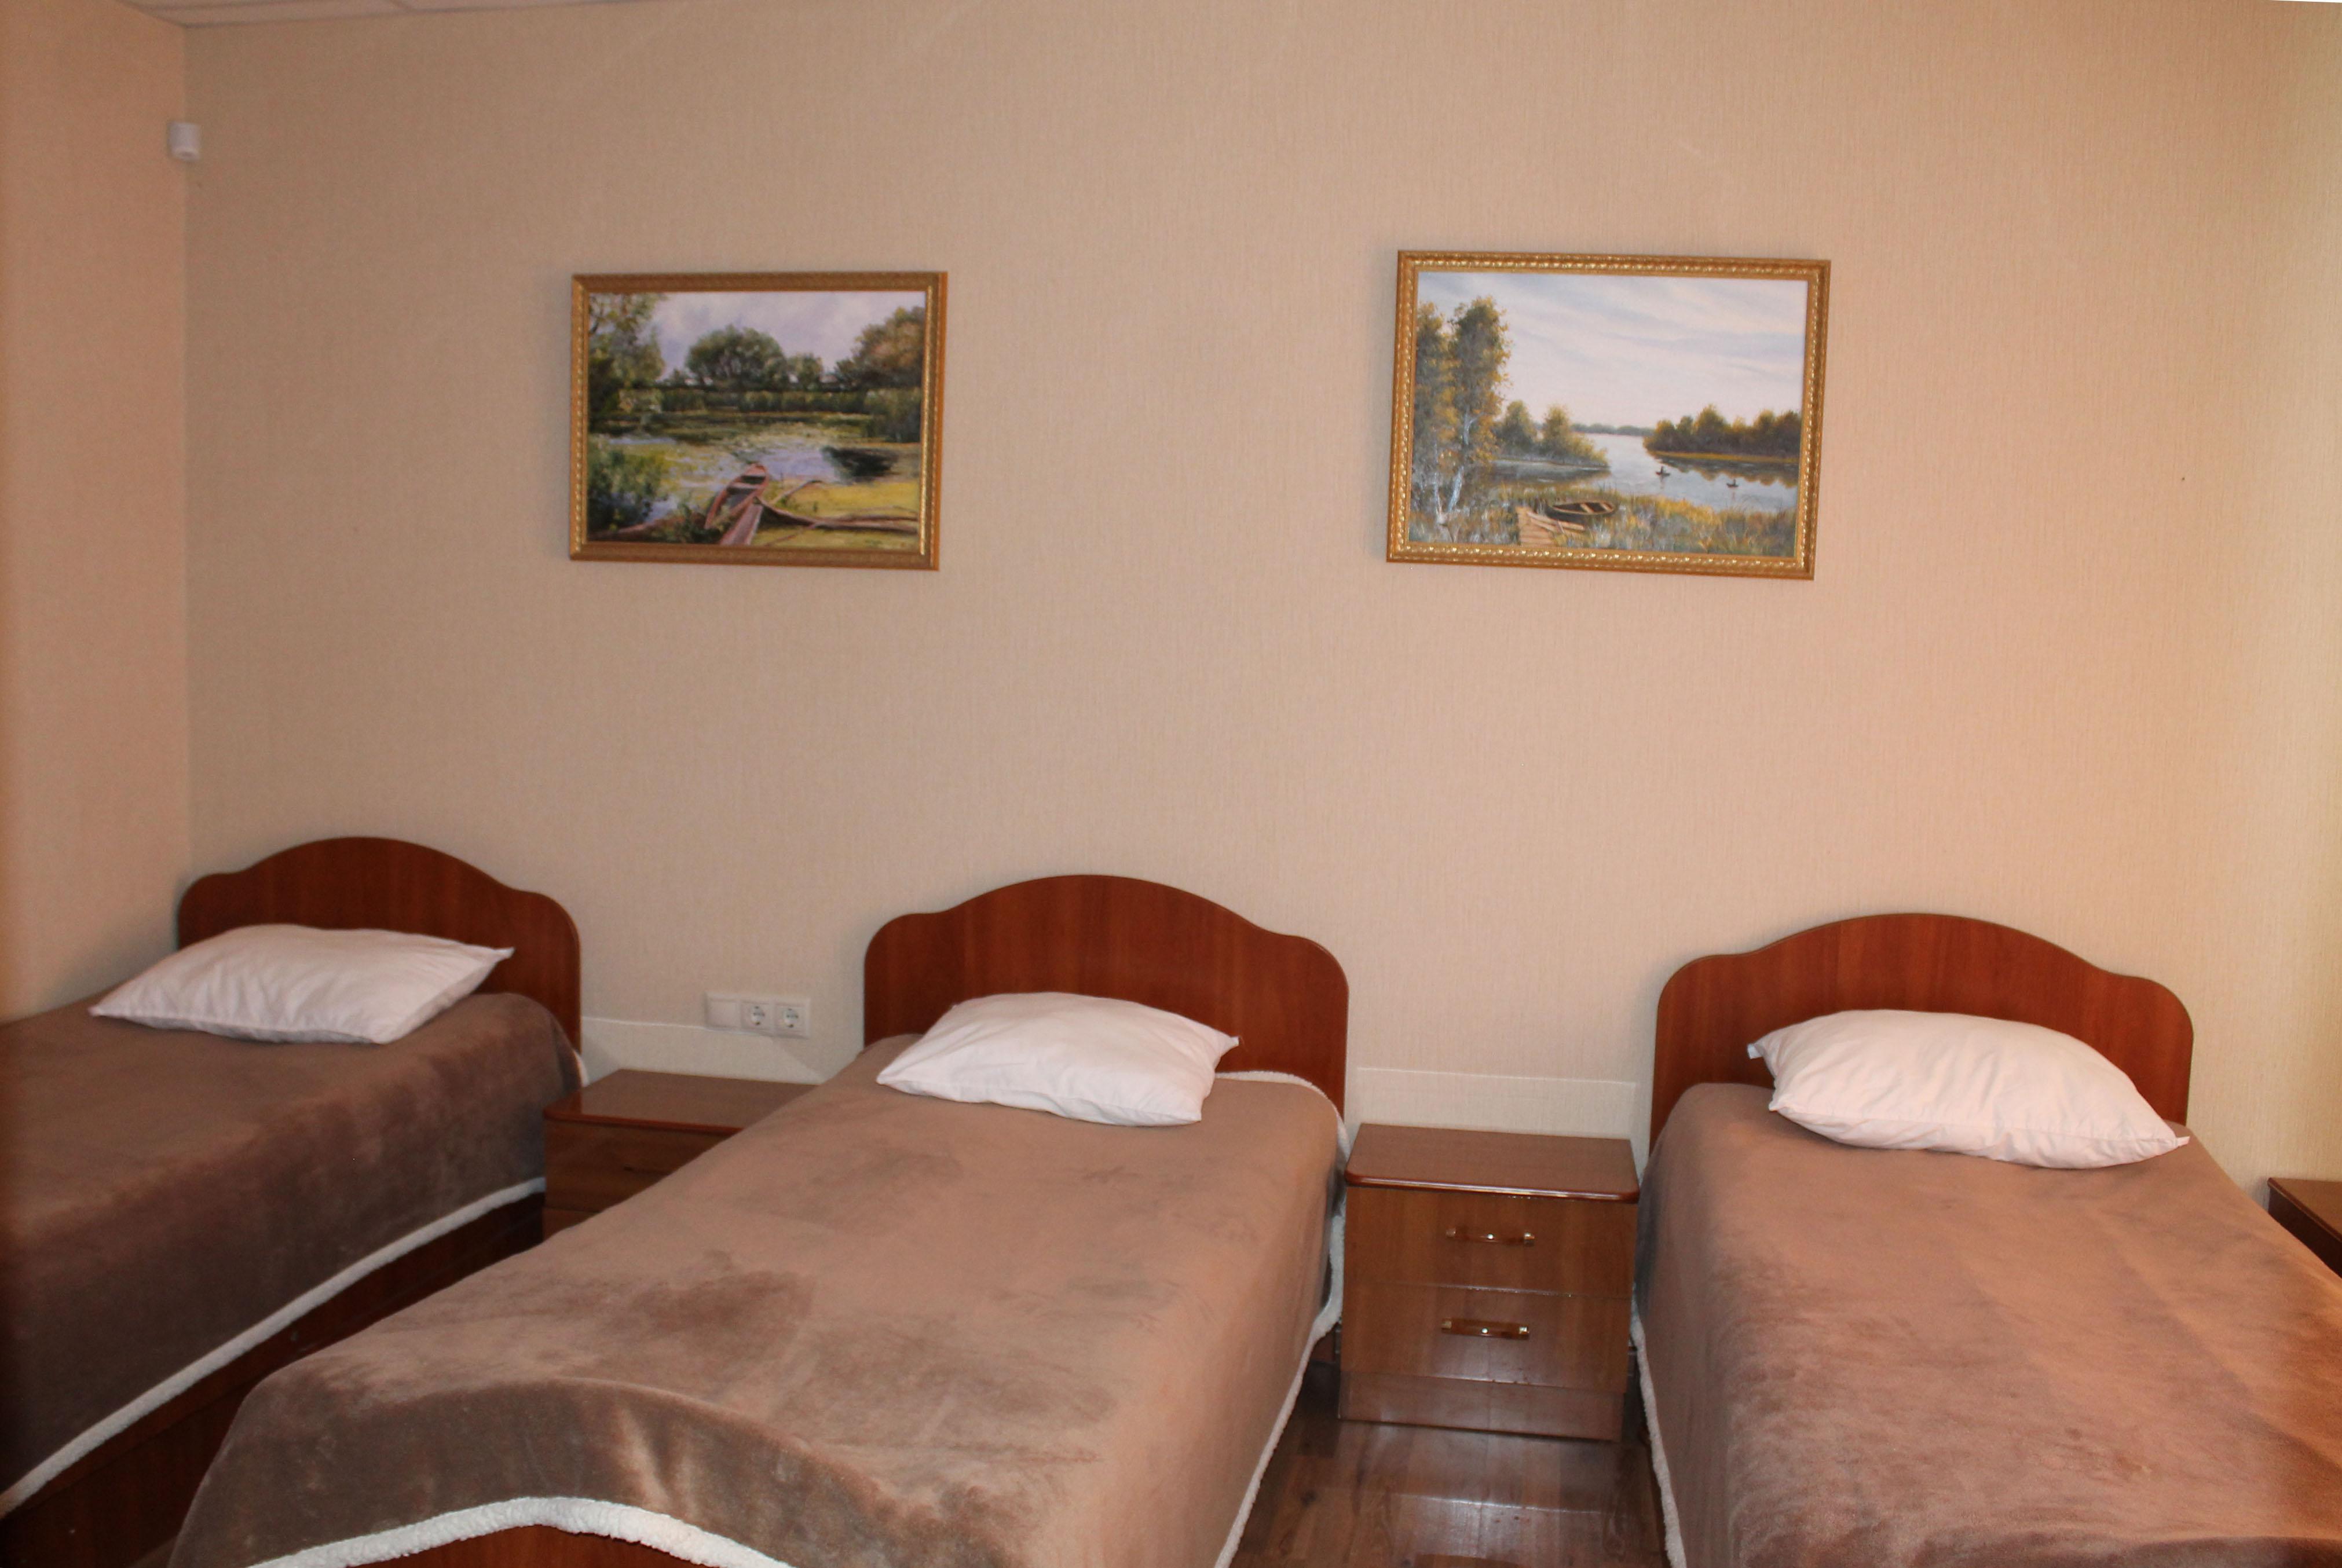 любом база отдыха маяк махачкала фото комнаты просто хороший макияж